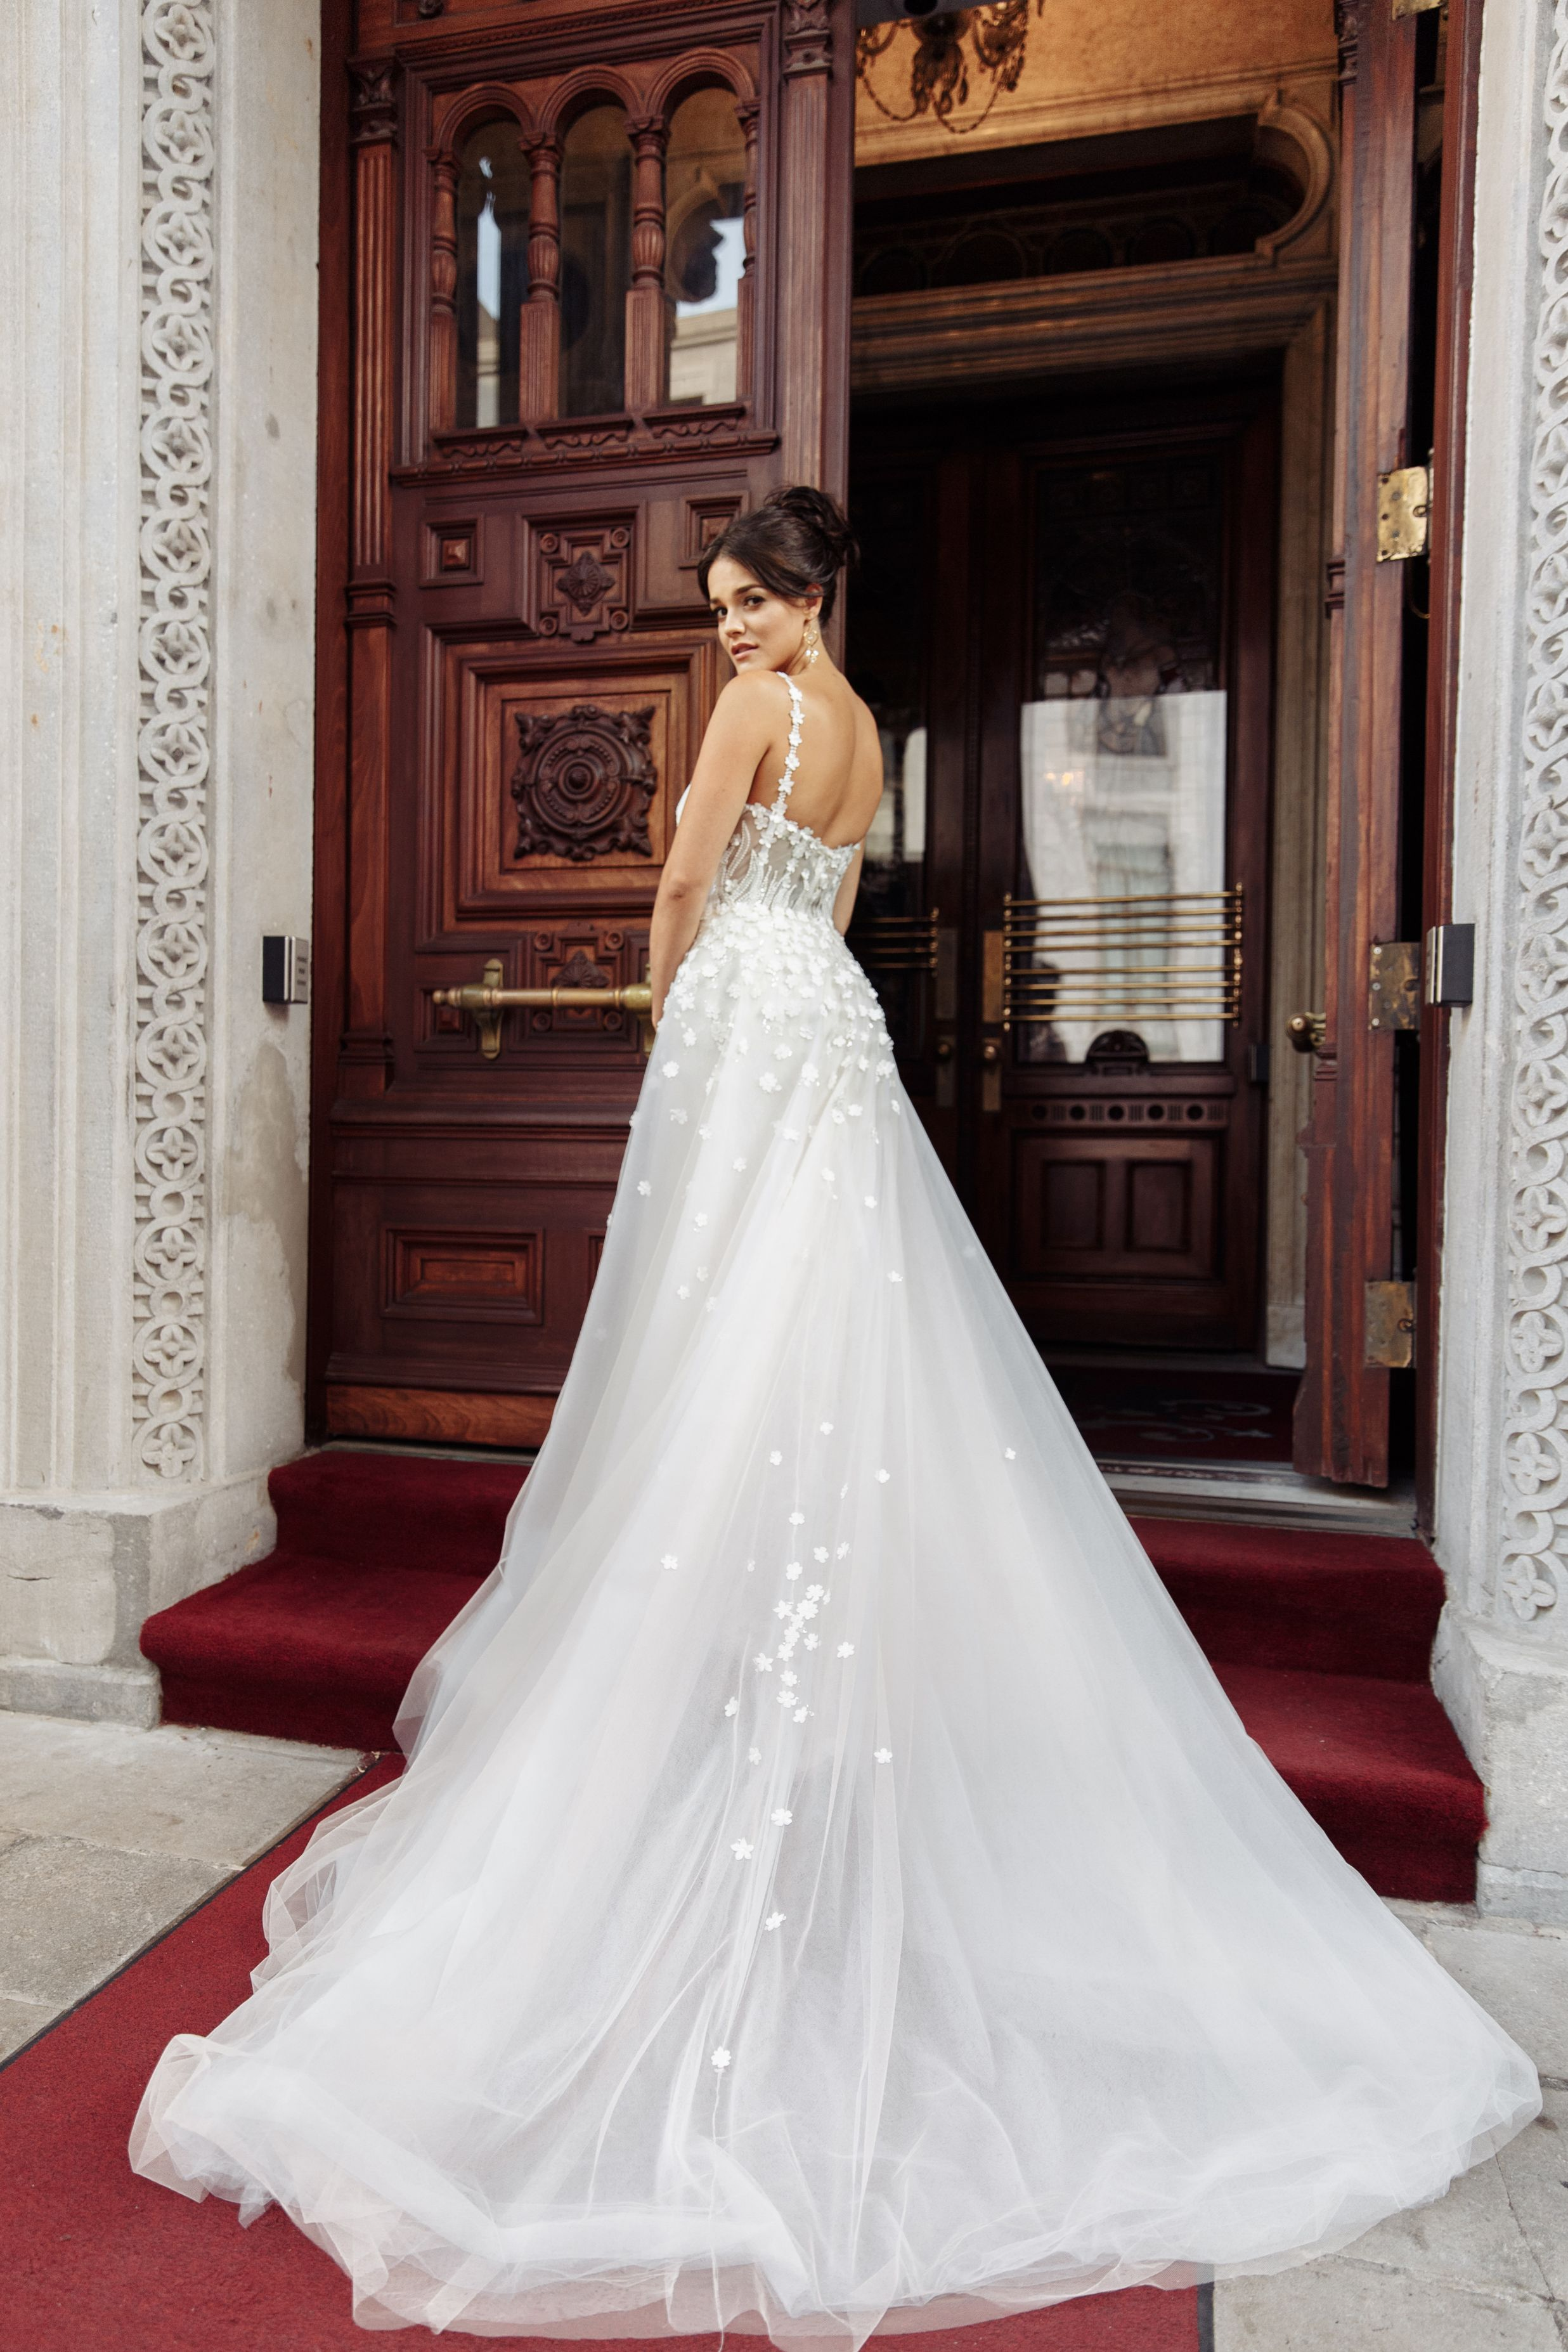 surjupe detachable robe de mariee montreal lilia haute couture designer de robes de mariee